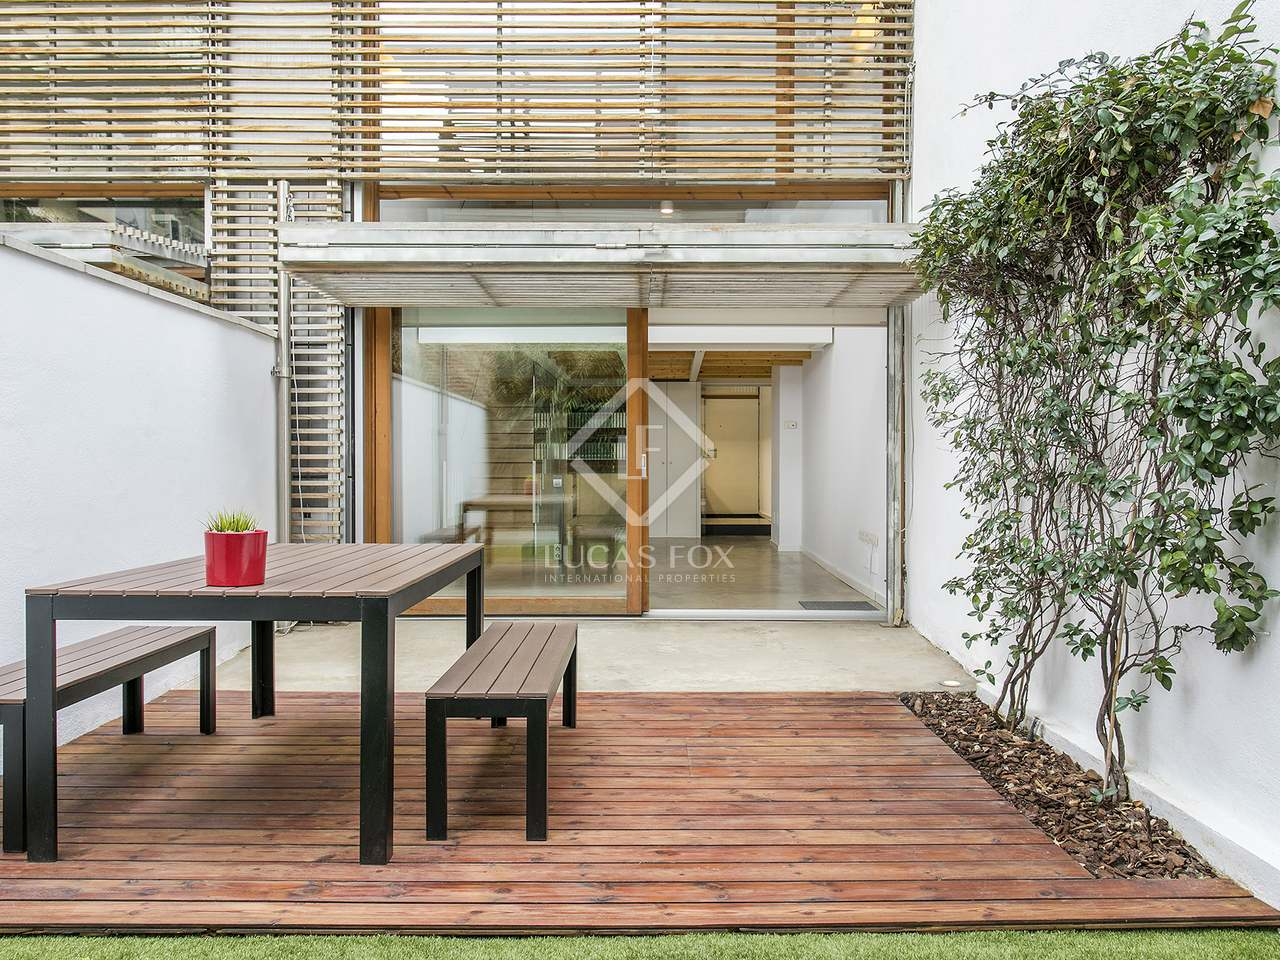 Casa de 140m en alquiler en poblenou barcelona for Casa alquiler barcelona jardin